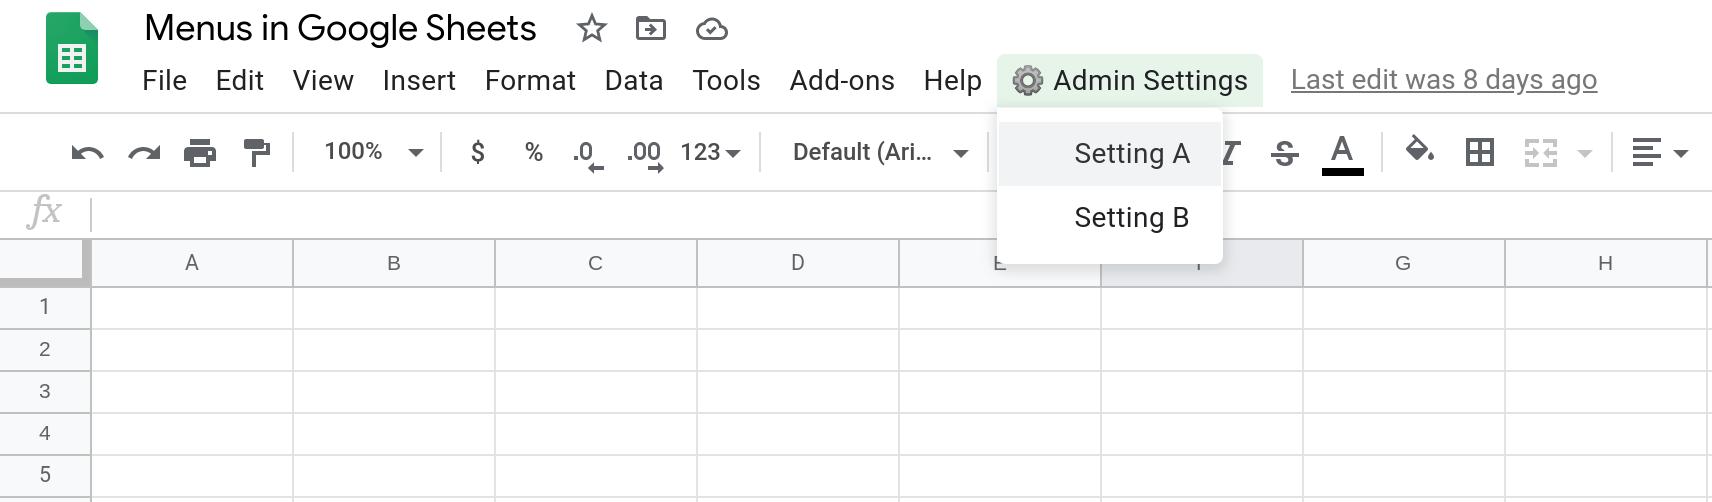 Screenshot of a Google Sheets spreadsheet showing a custom menu with two menu items.